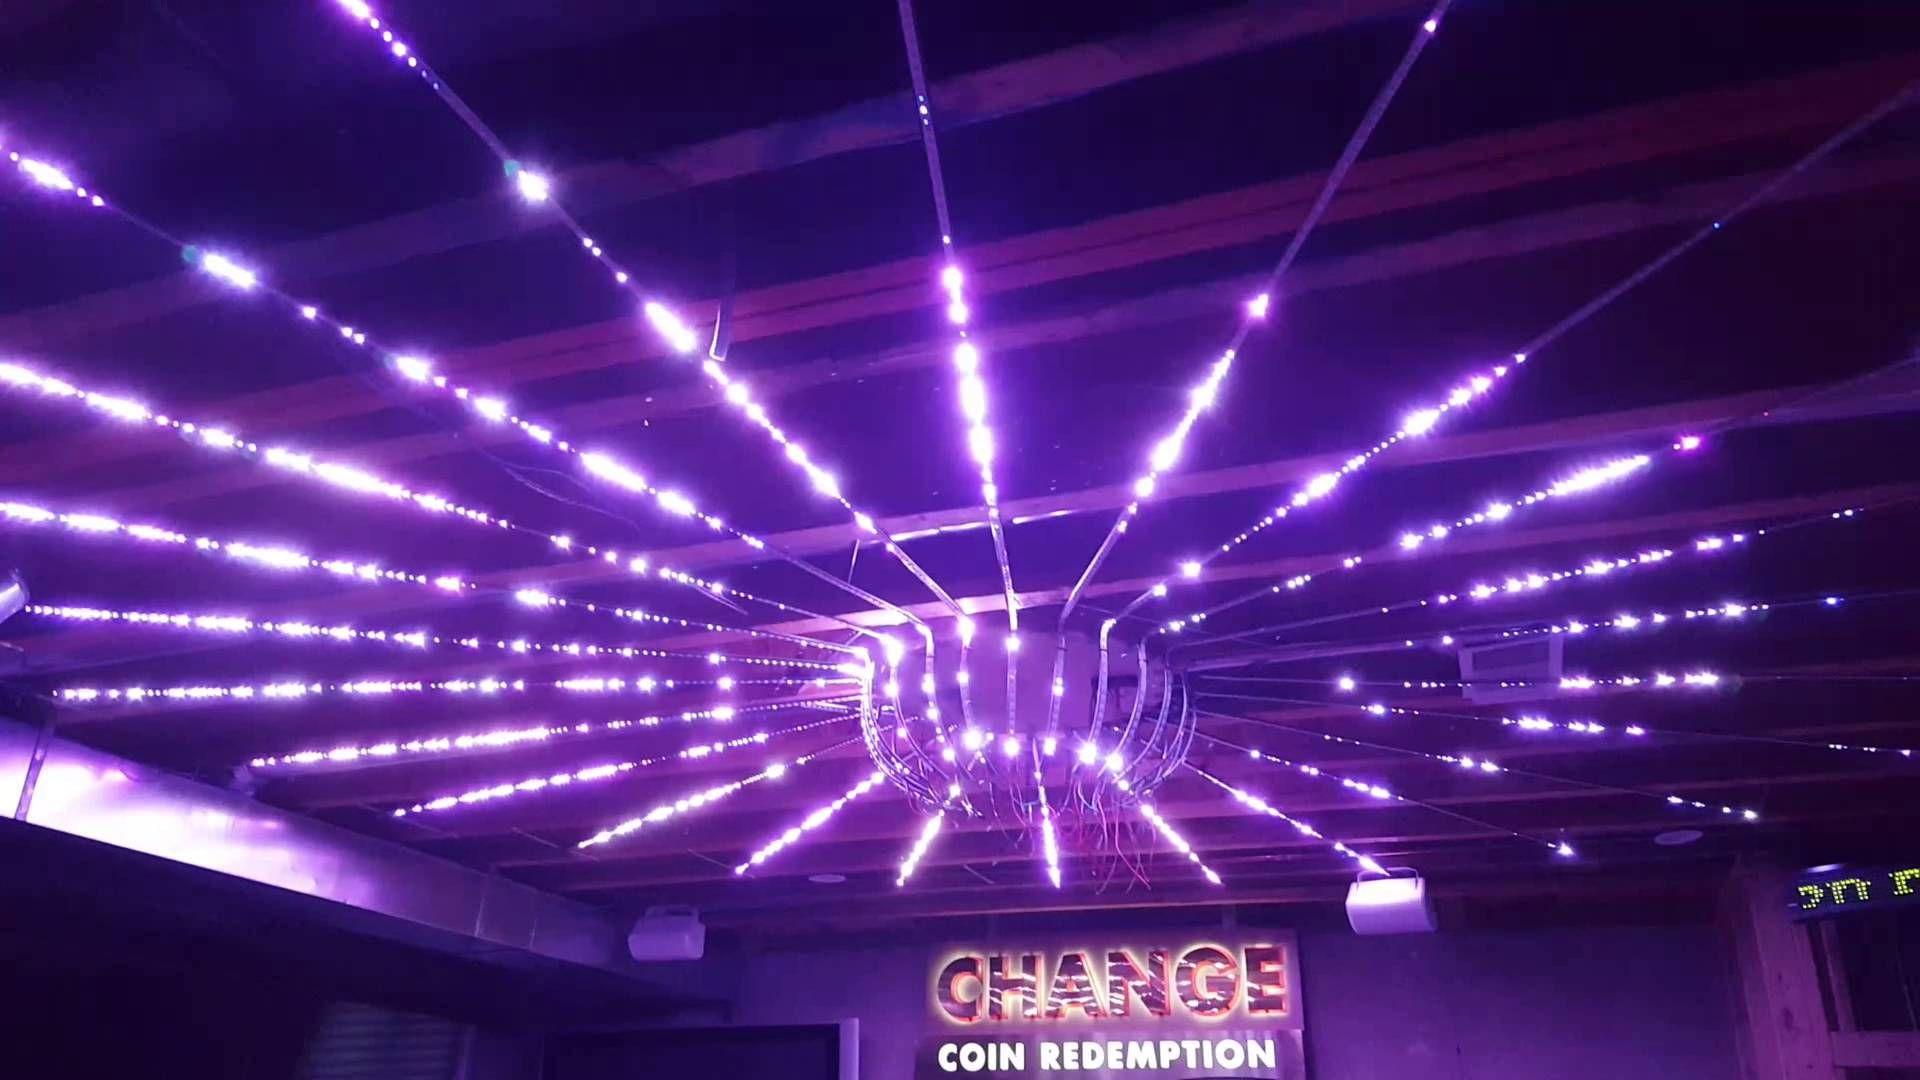 Ws2812b Led Ceiling Installation Disco Lights Outdoor Ceiling Lights Led Deck Lighting Led Color Changing Lights